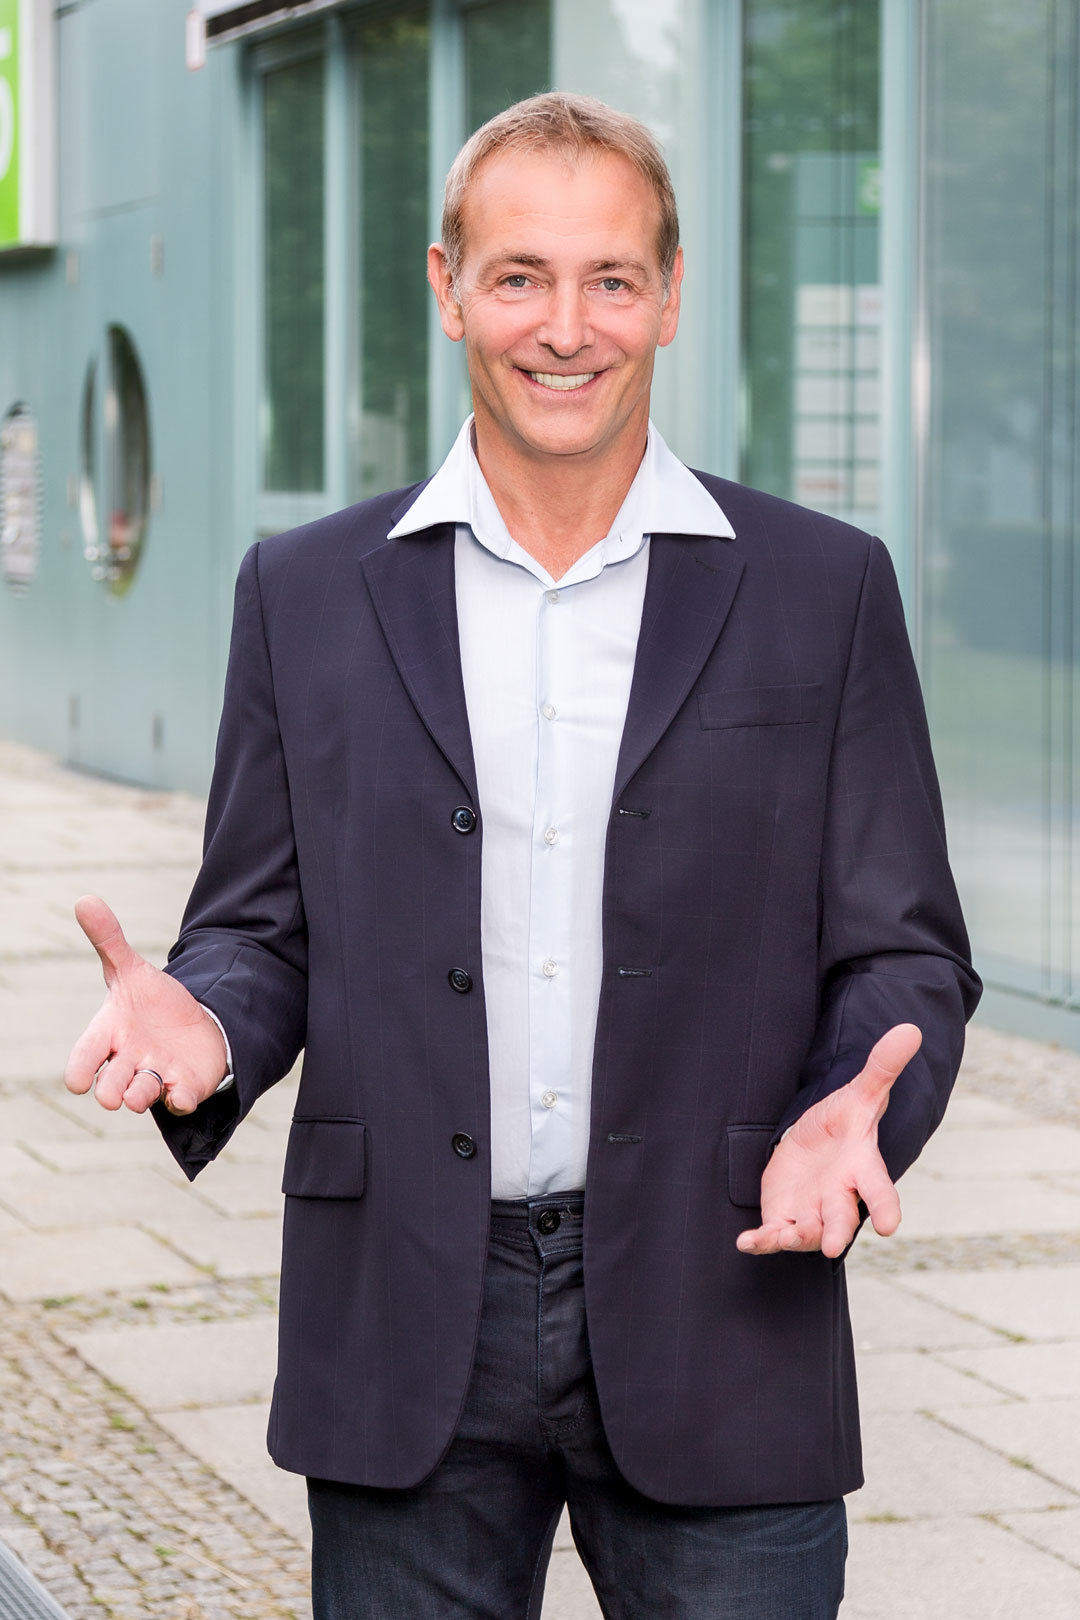 Zahnarztcoach-Mathias-Leyer-Gesundheitsoekonom-Zahnarzt-Coaching-Zahnarztpraxen-Unternehmensberatung-fuer-die-Zahnarztpraxis